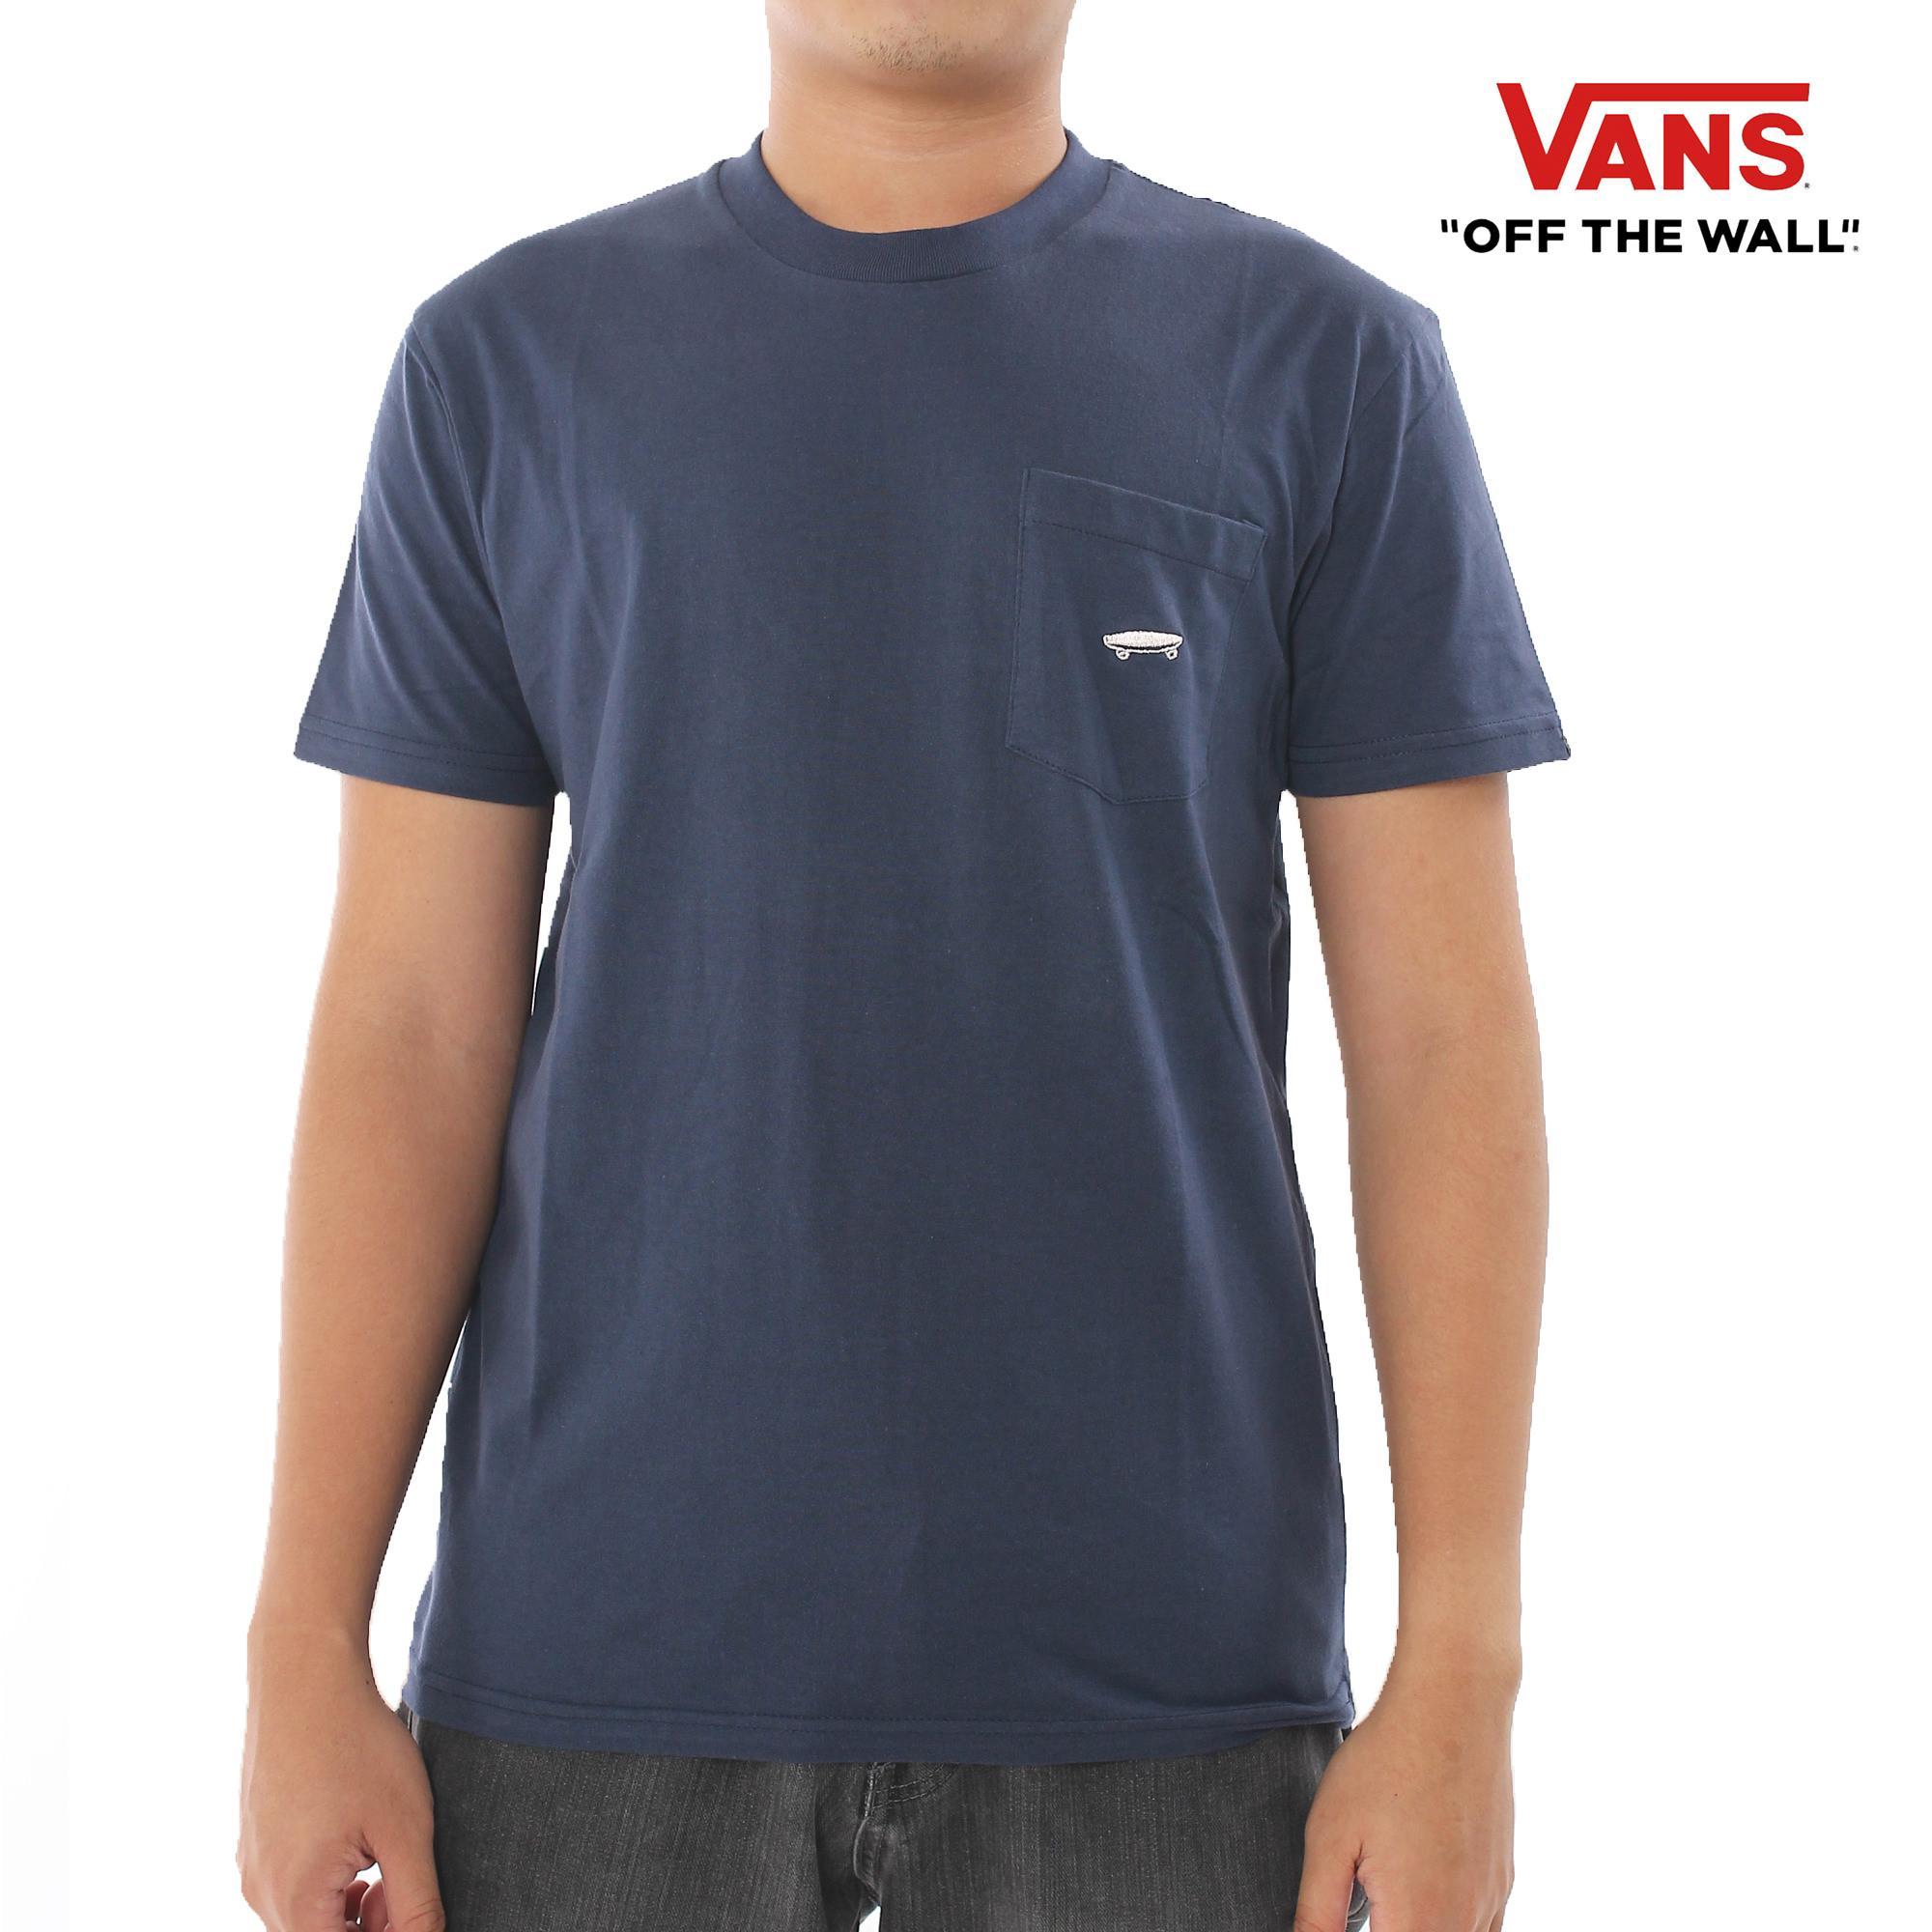 29fd12bb3c T-Shirt Clothing for Men for sale - Mens Shirt Clothing online ...